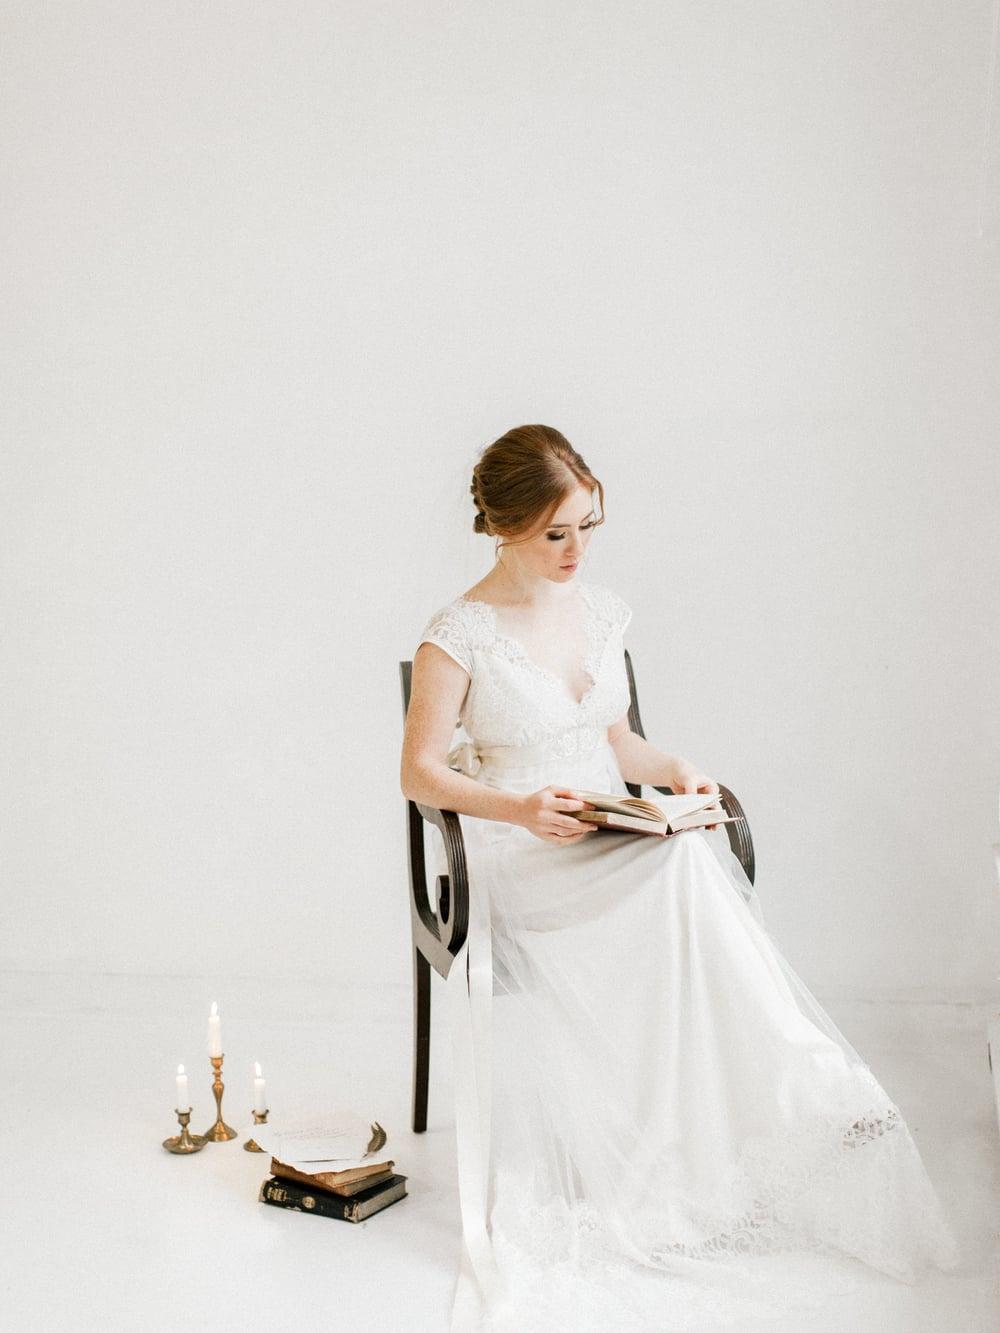 jane-austen-wedding-inspiration-shoot-lace-14.jpg